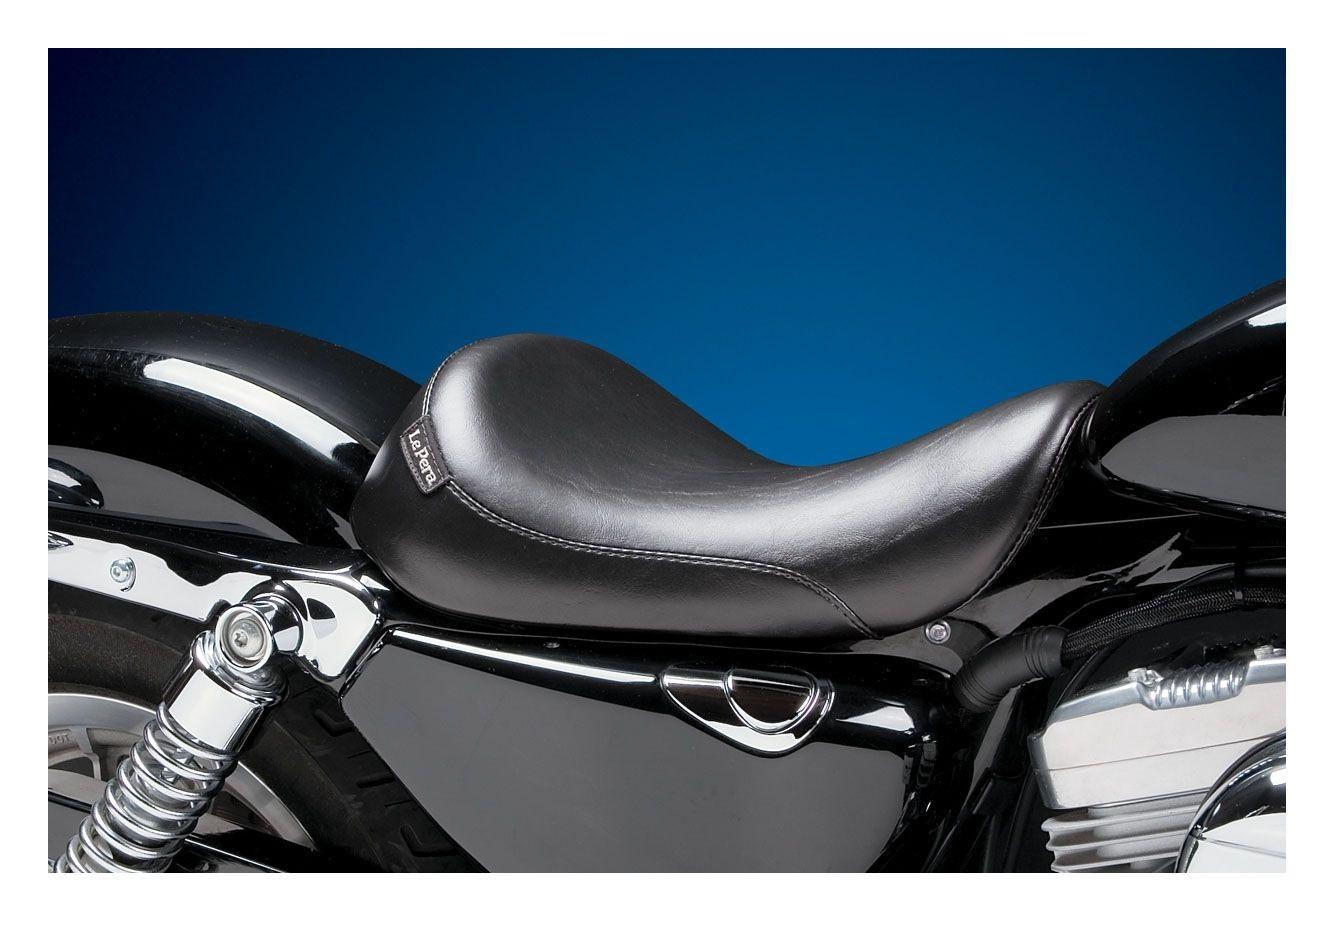 Le Pera Silhouette Solo Seat For Harley Sportster With 45 Gallon Revolution X Engine Diagram Tank 2004 2019 10 2501 Off Revzilla